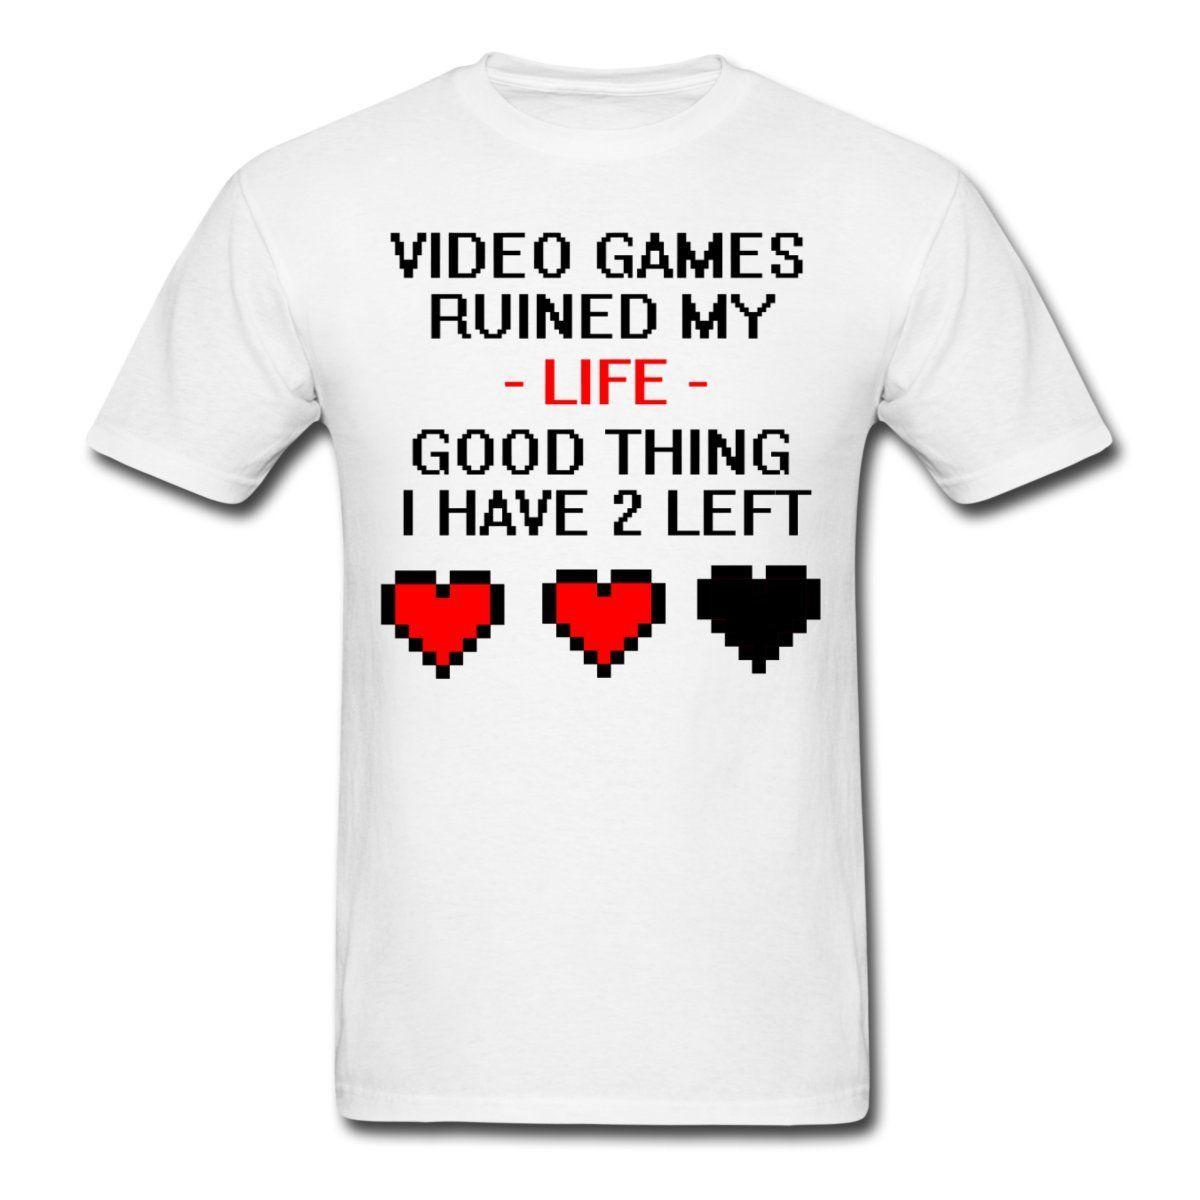 Video Games Ruined My Life Funny Quote Mens T-Shirt Casual Short Sleeve Tshirt Novelty Fashion Logo Printing T Shirts